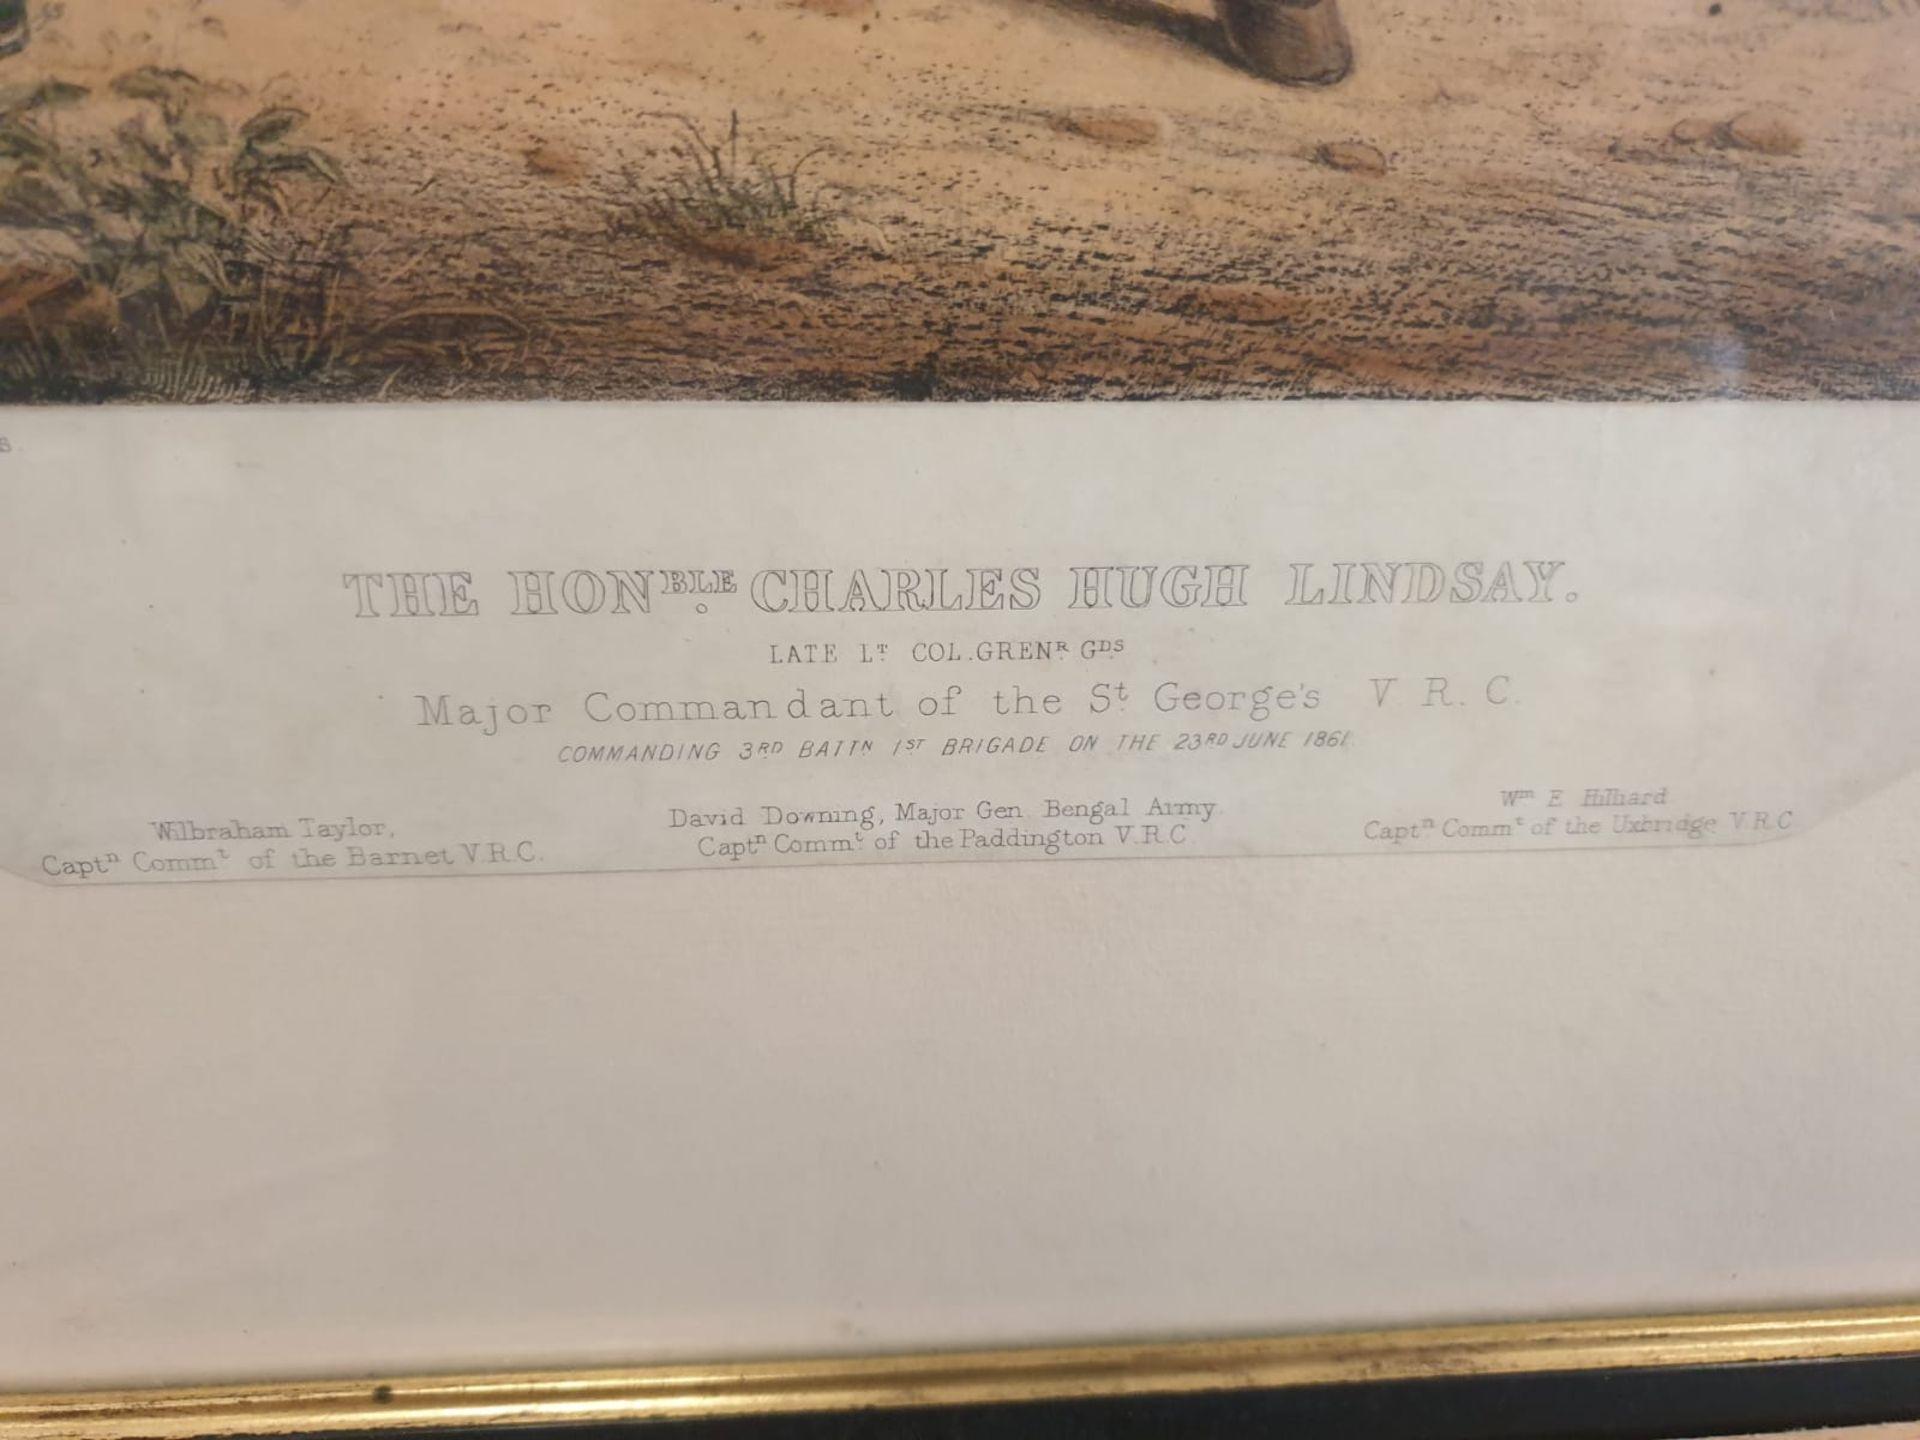 Framed Coloured Print Portrait Of The Honourable Charles Hugh Lindsay Major Commandant Of The St - Image 3 of 3